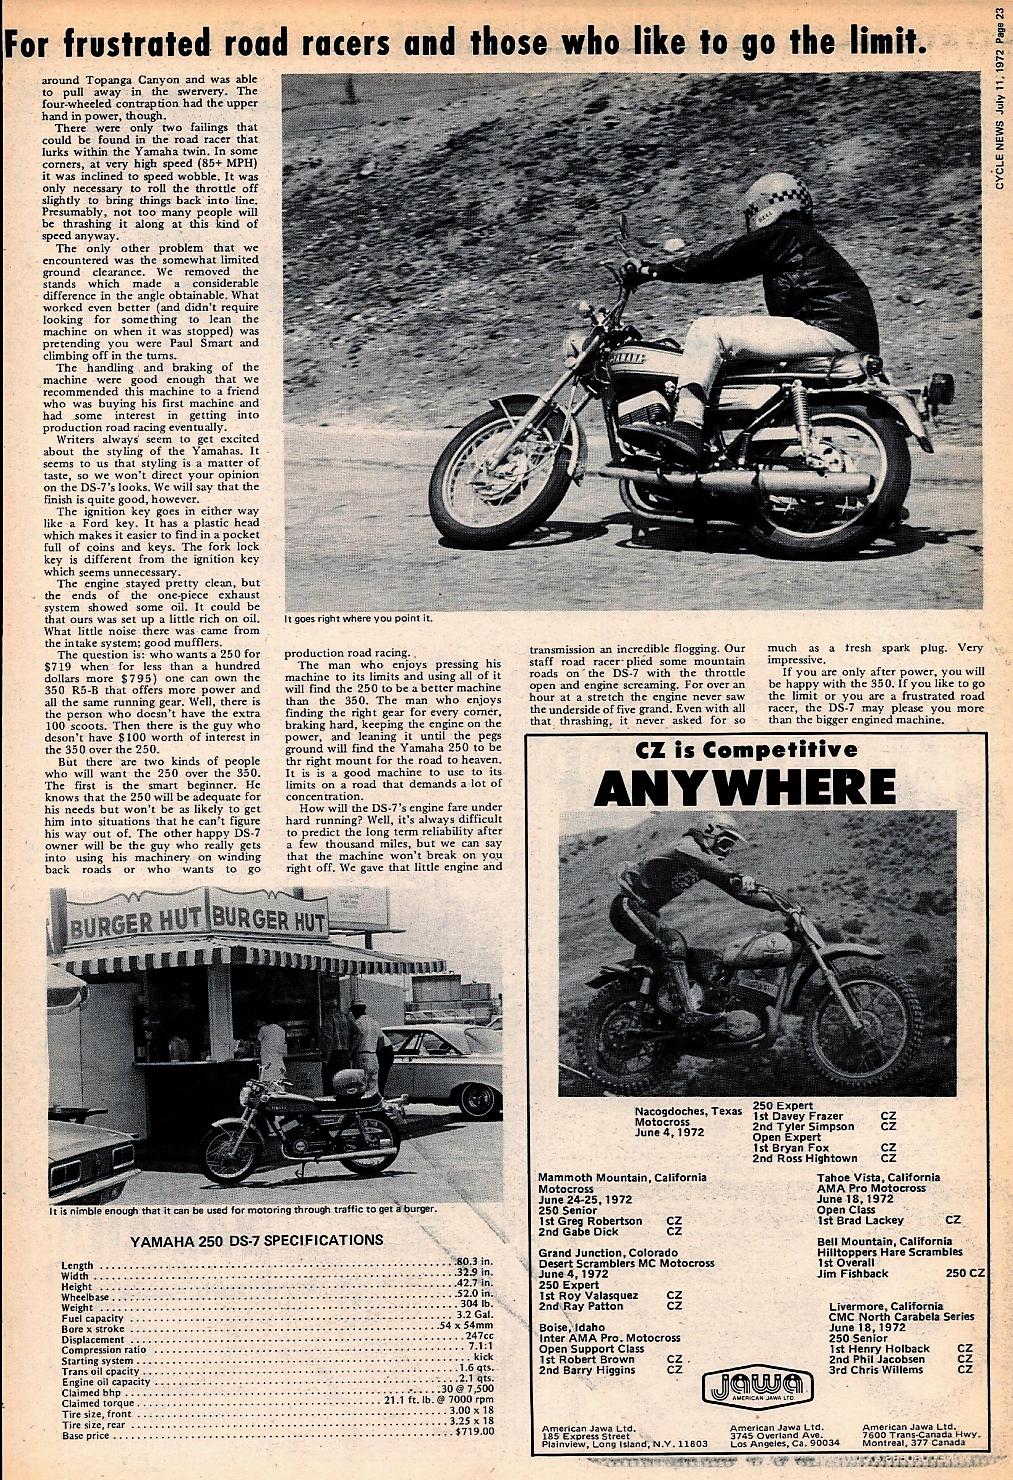 1972 Yamaha 250 DS 7 road test.2..jpg